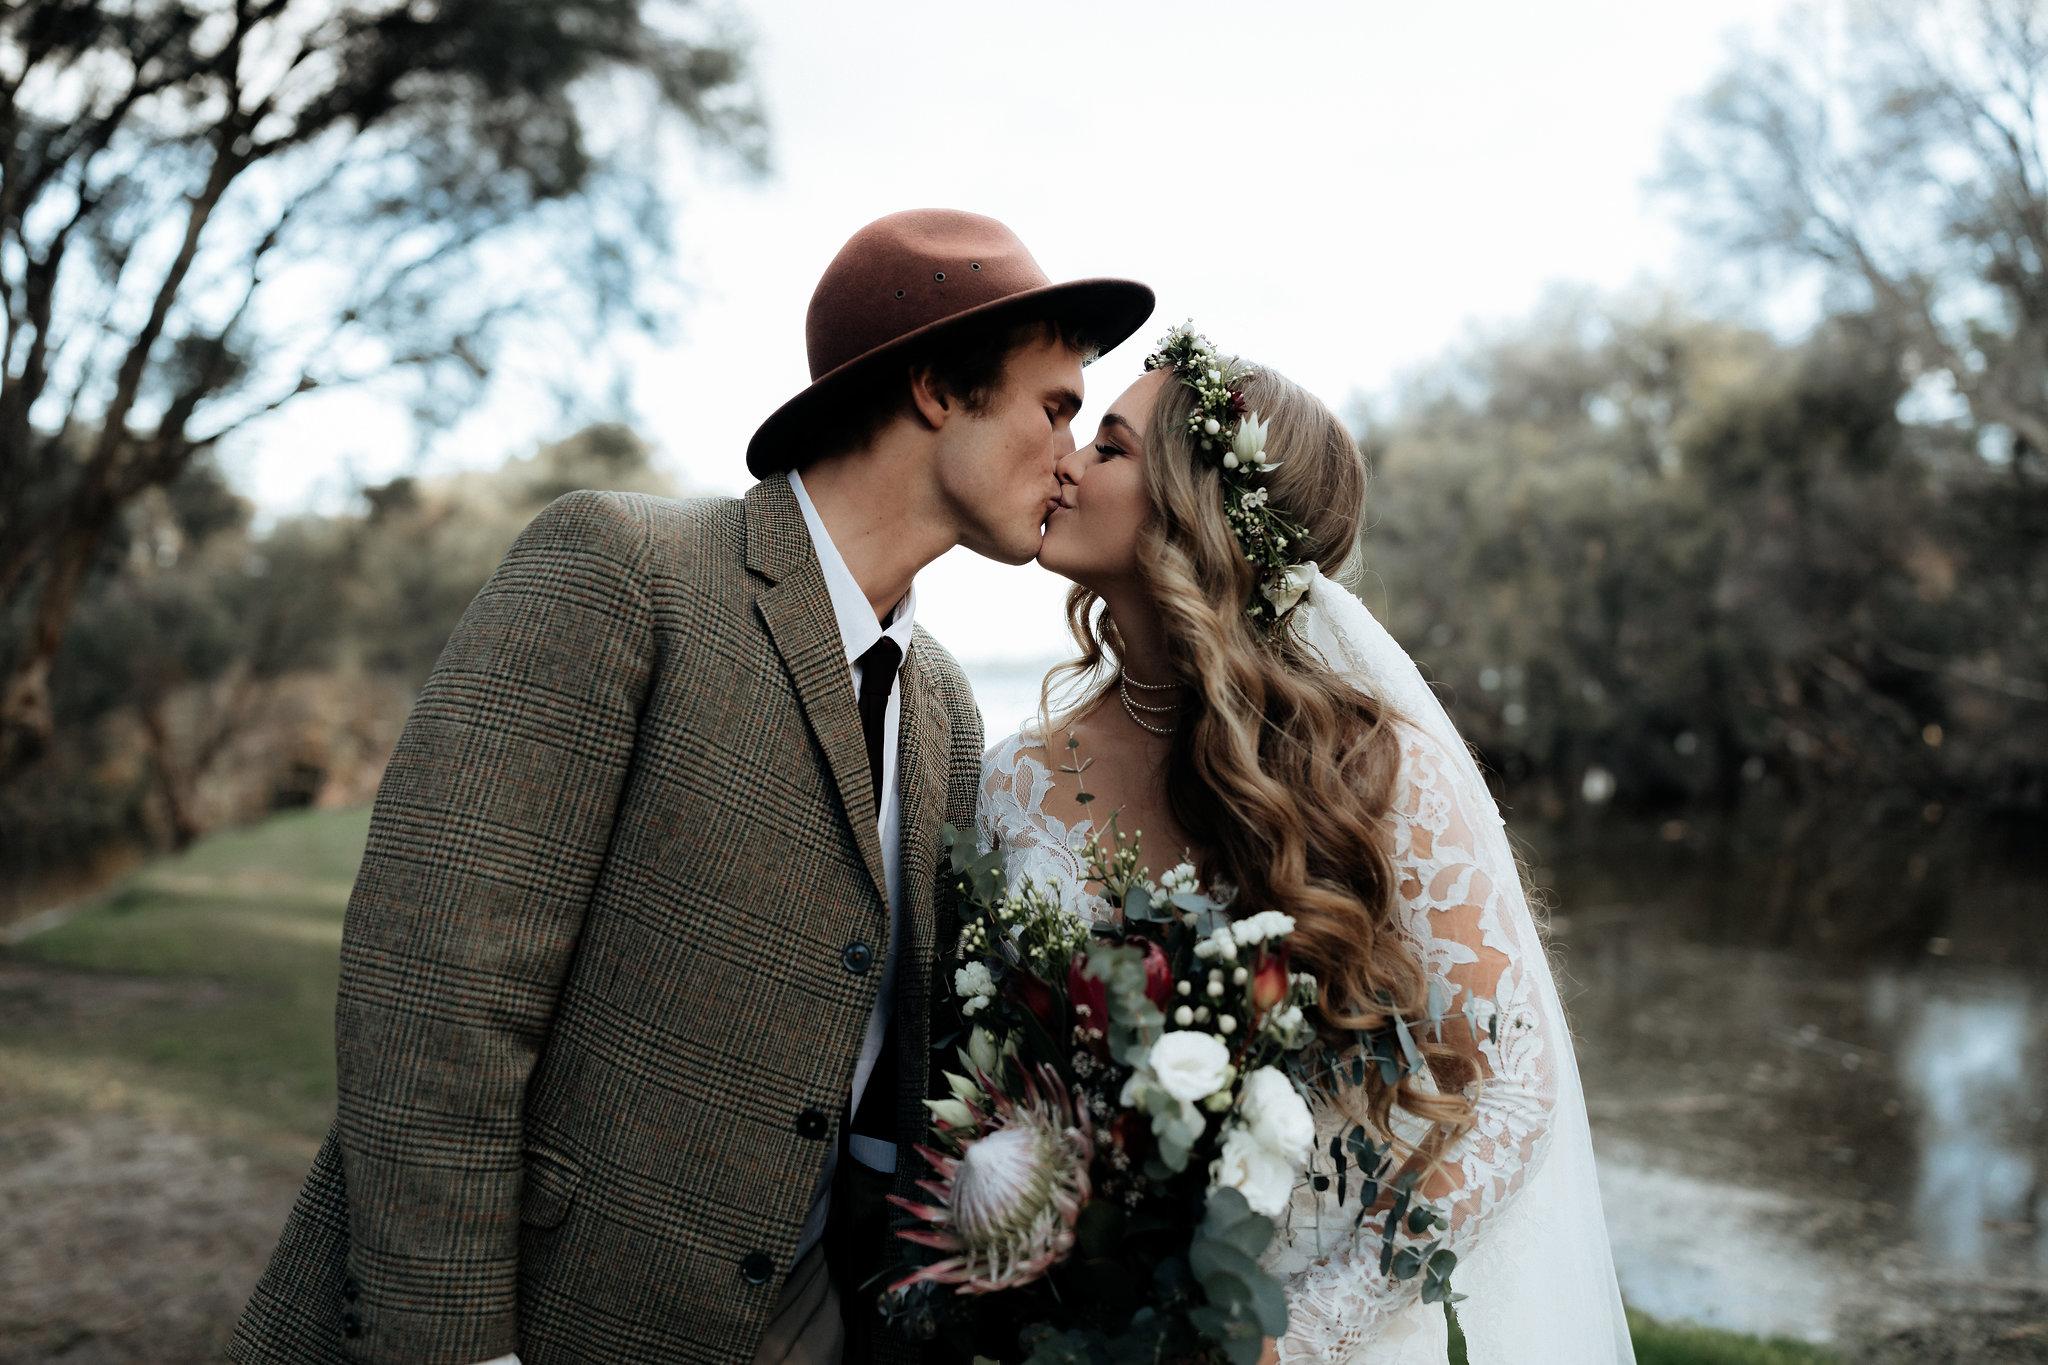 Categories: Weddings-Real Wedding: Eleanor & Aaron - Photography by Alexandra Cohen